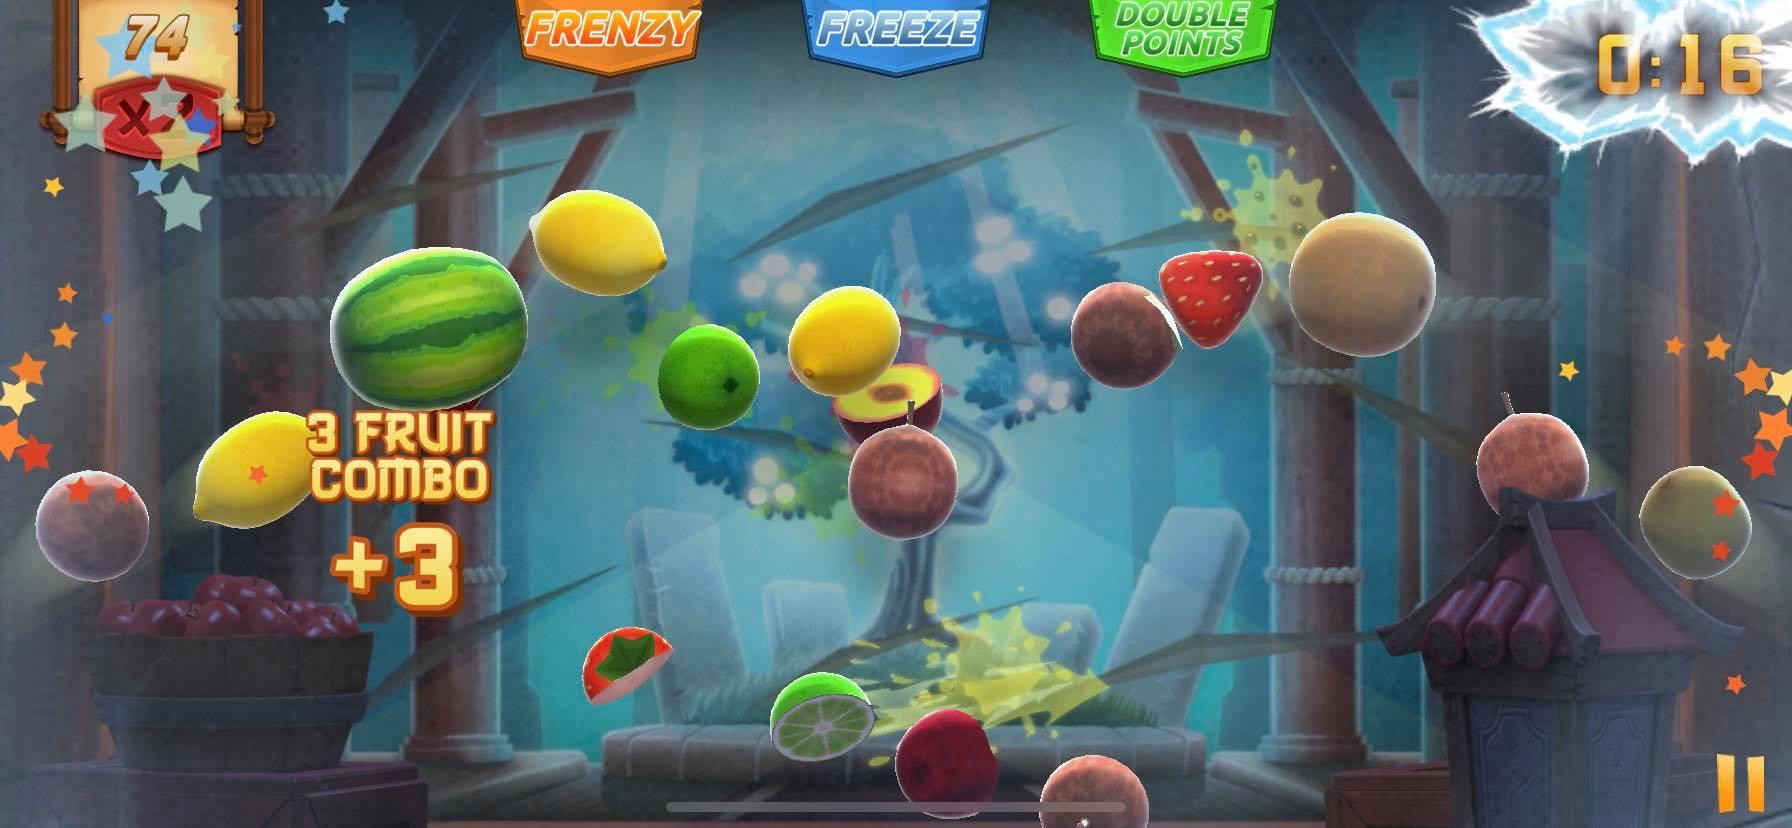 Ngập tràn trái cây trong Fruit Ninja 2